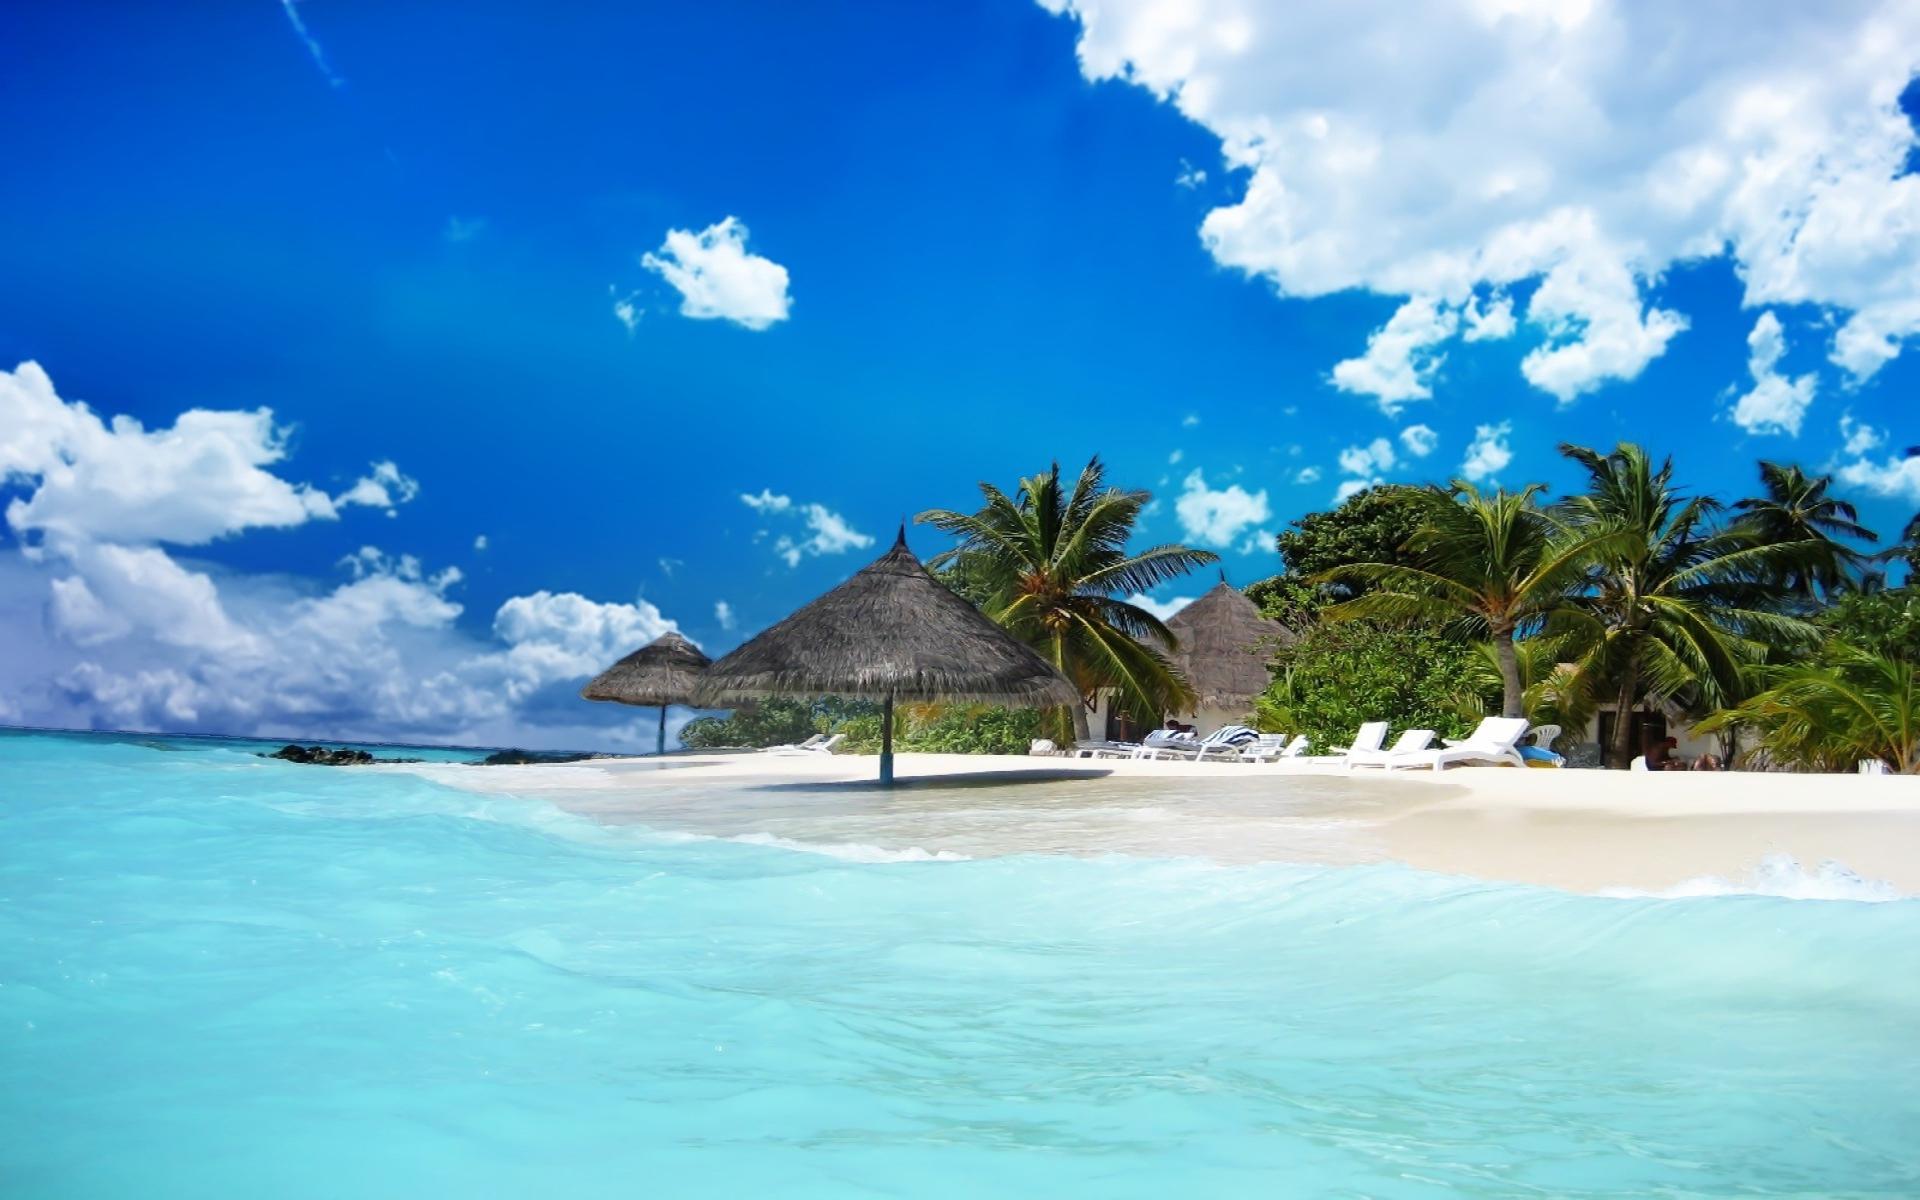 Maldives Beach 4K Wallpapers | Wide Screen Wallpaper 1080p ...